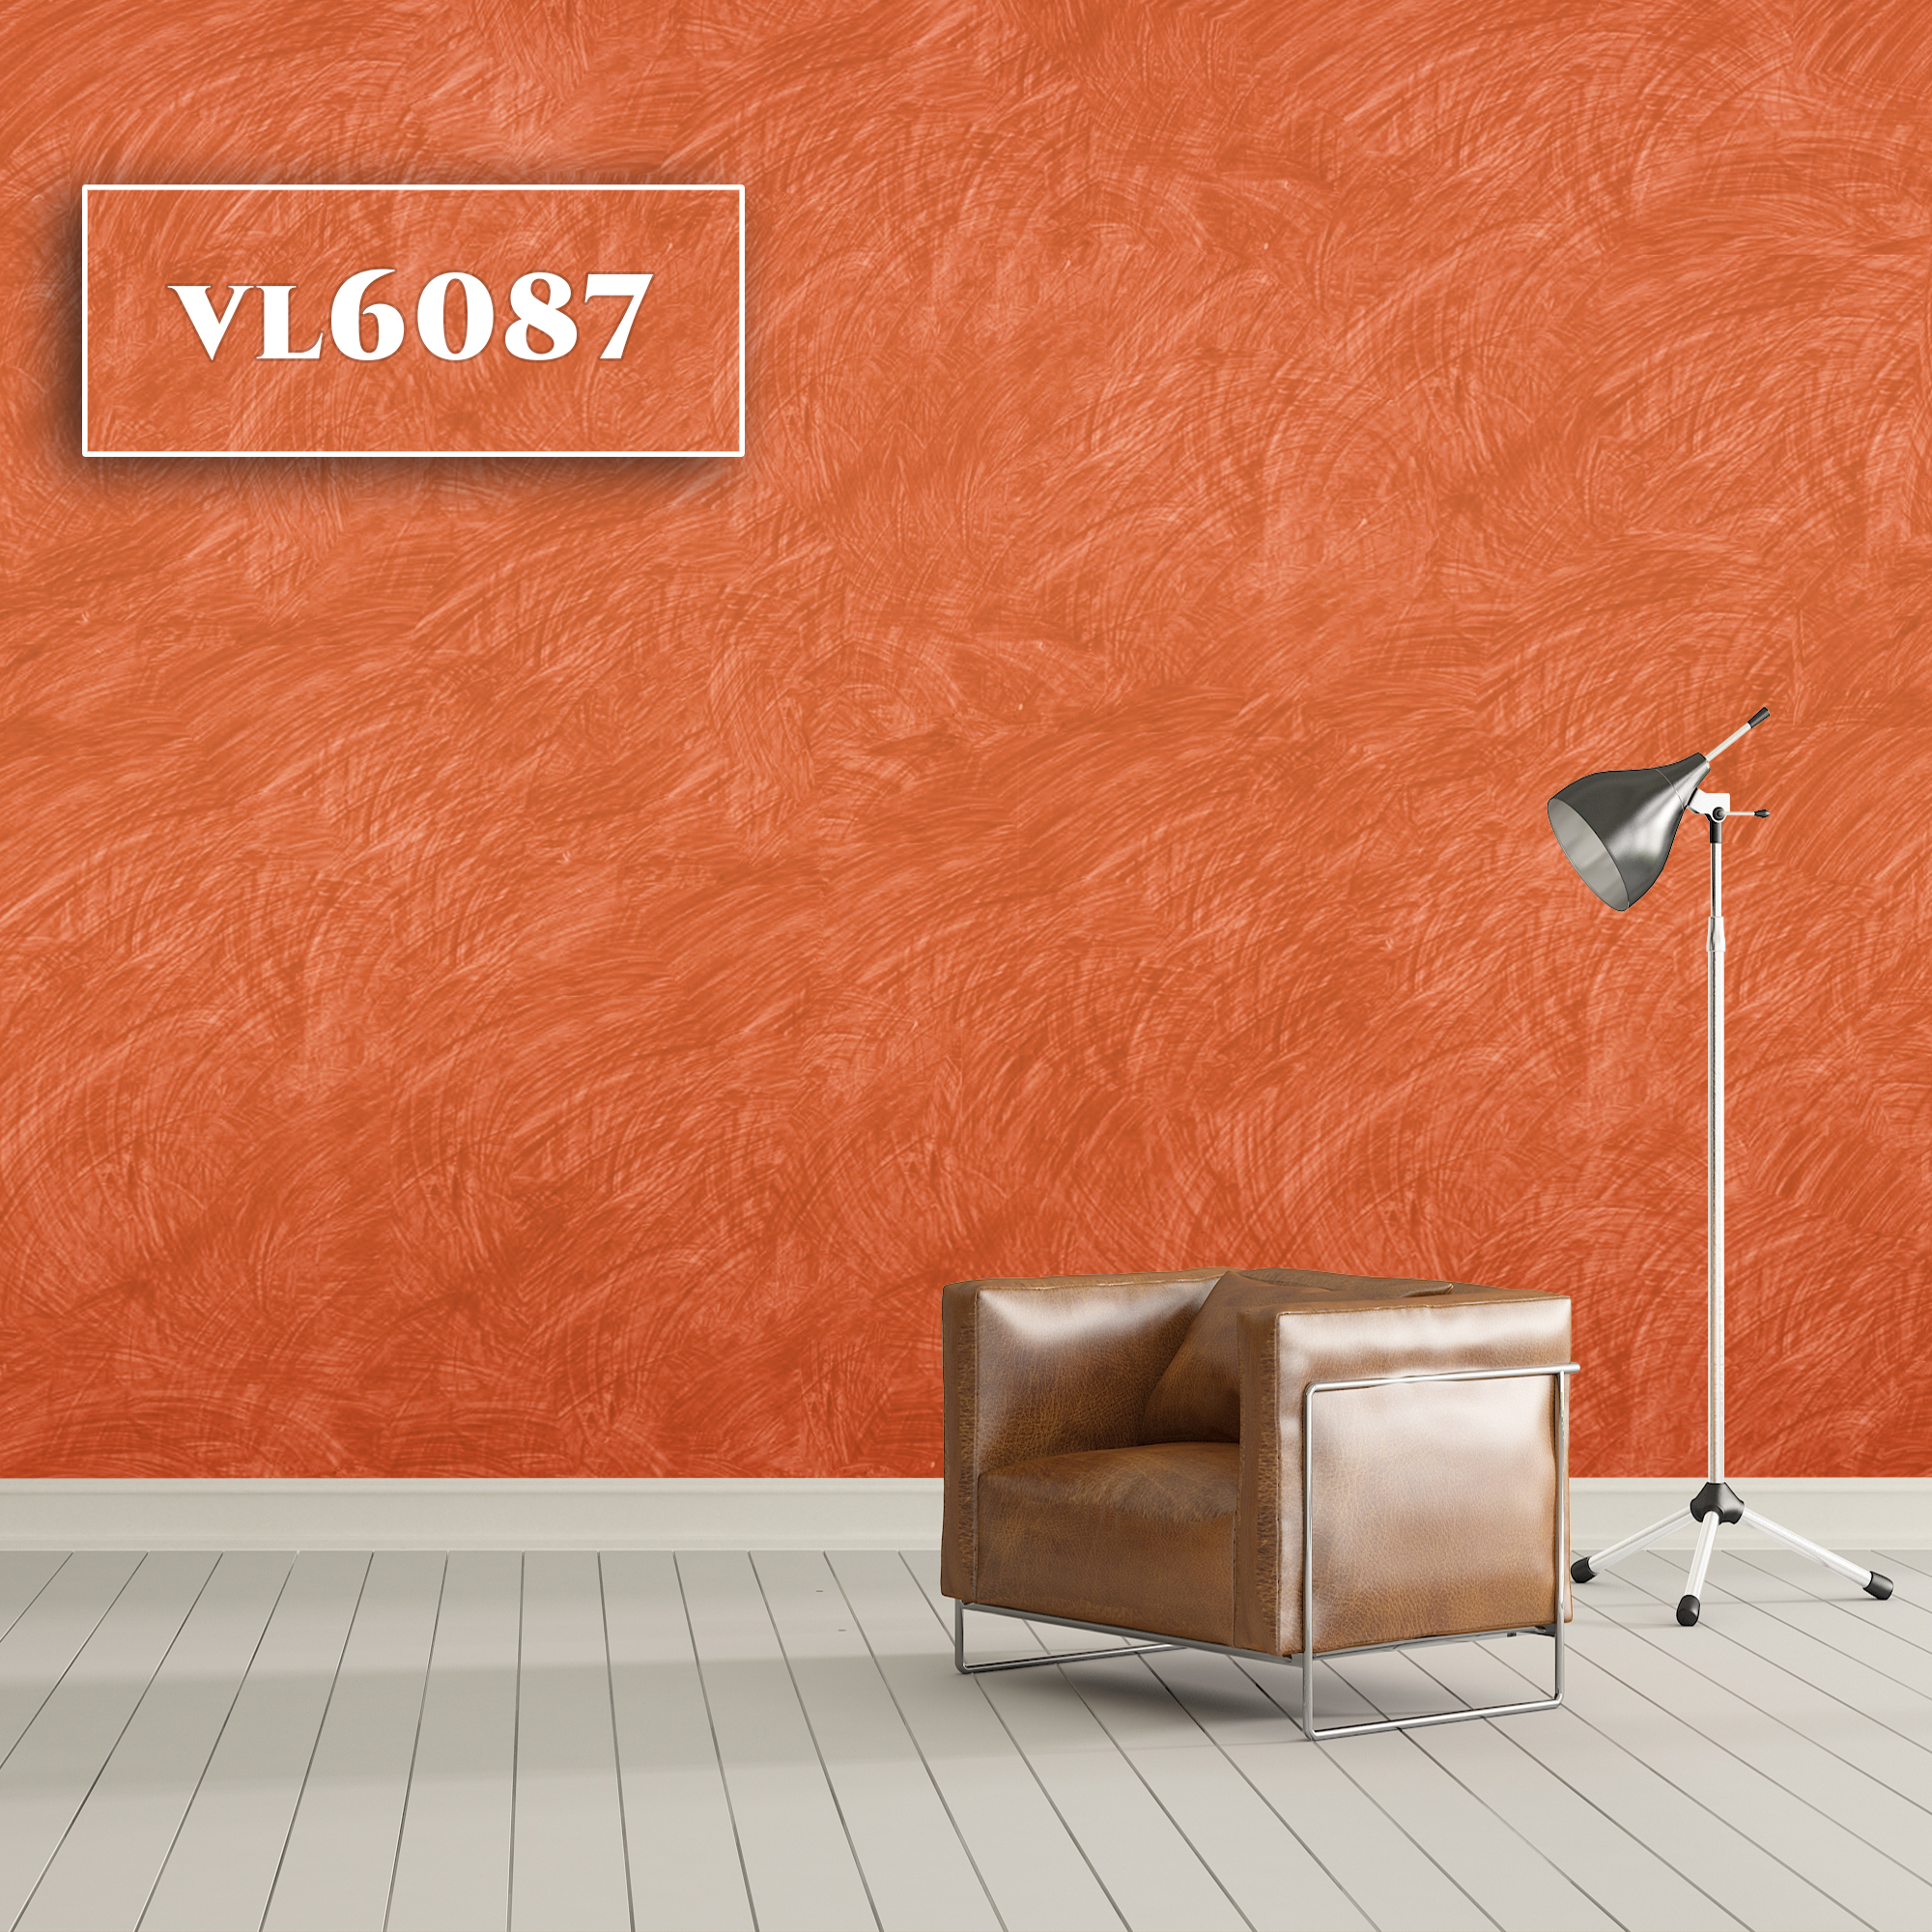 VL6087